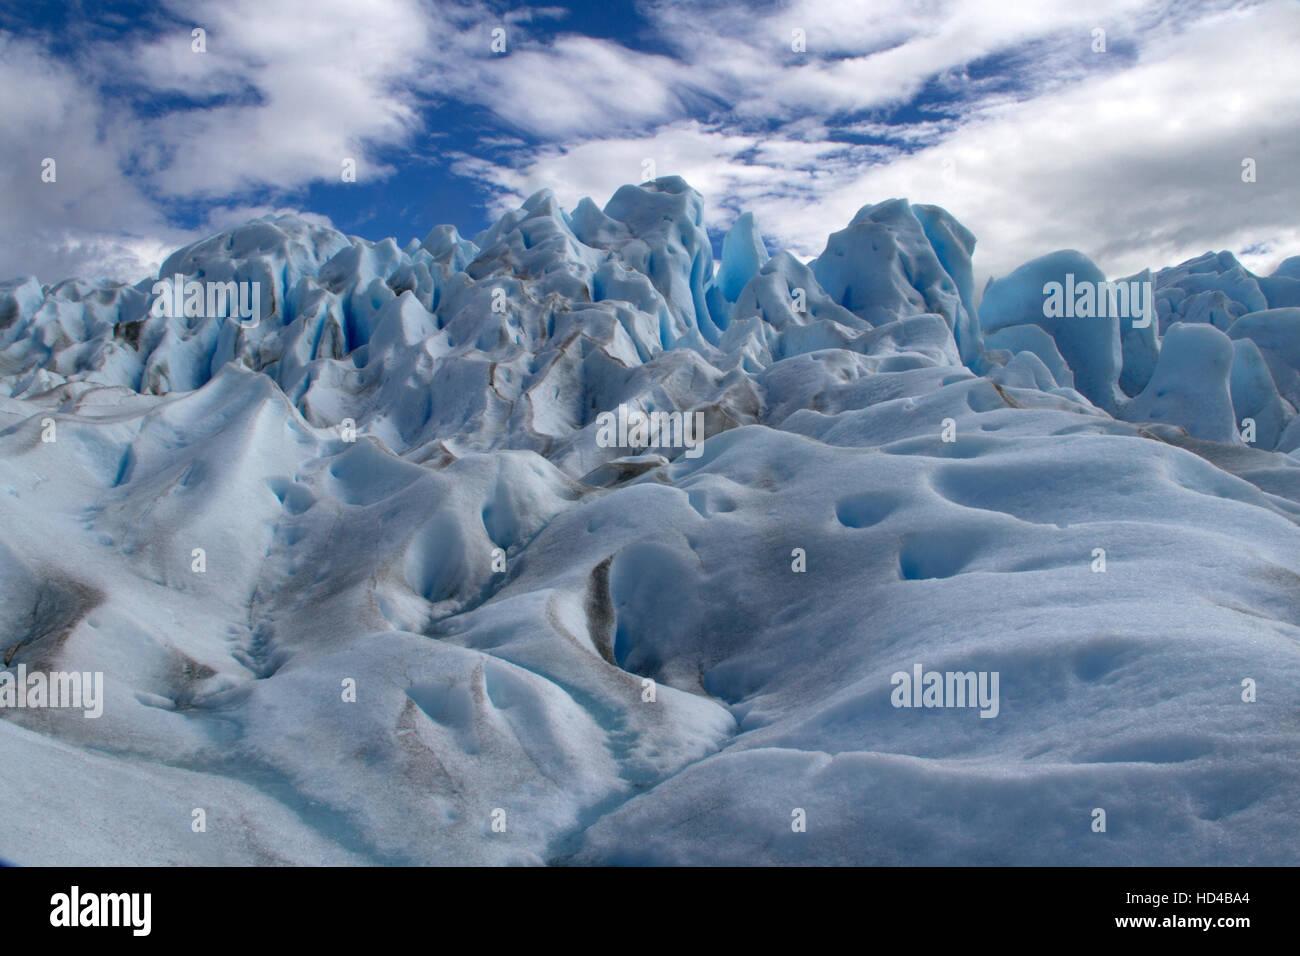 EL CALAFATE, ARG, 06.12.2016: Argentinischen Perito Moreno-Gletscher im Nationalpark Los Glaciares in Südwest Stockbild